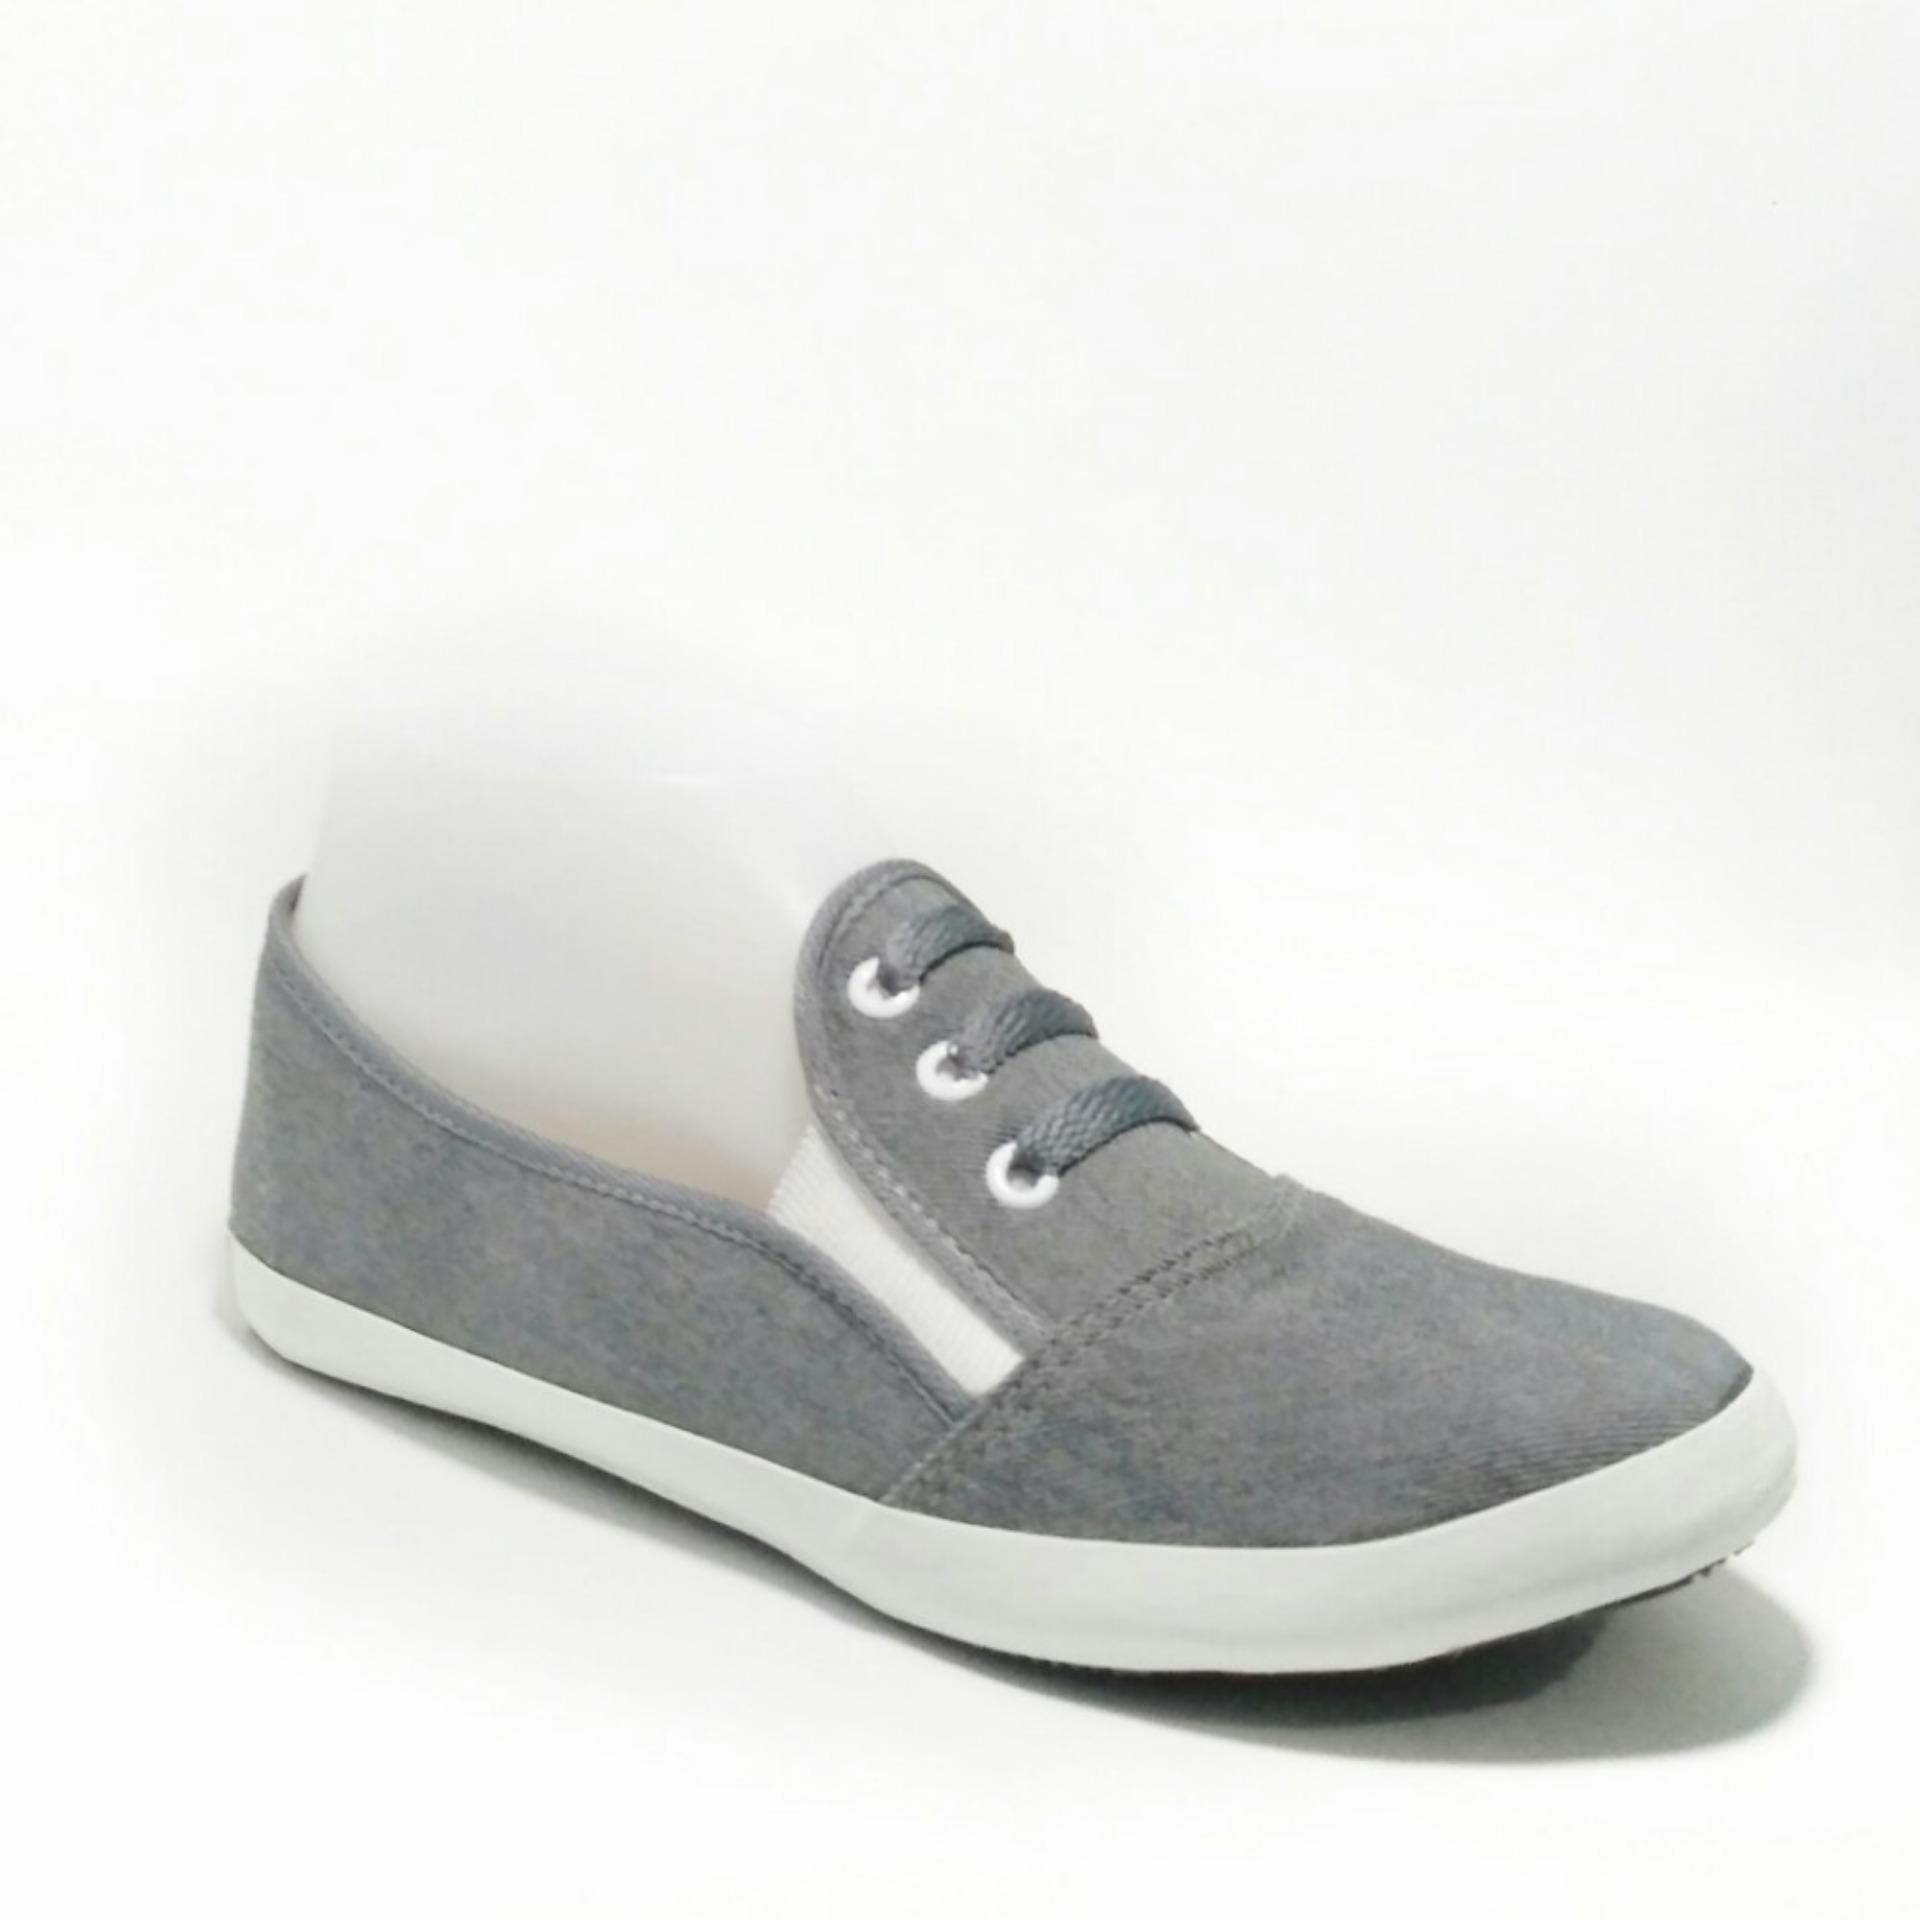 Sepatu Sandal Wanita Flatshoes Slip On Ringaan Navy Blue Daftar Dea Flat Shoes 1704 59 Coffee Size 36 41 Cokelat 40 Abu